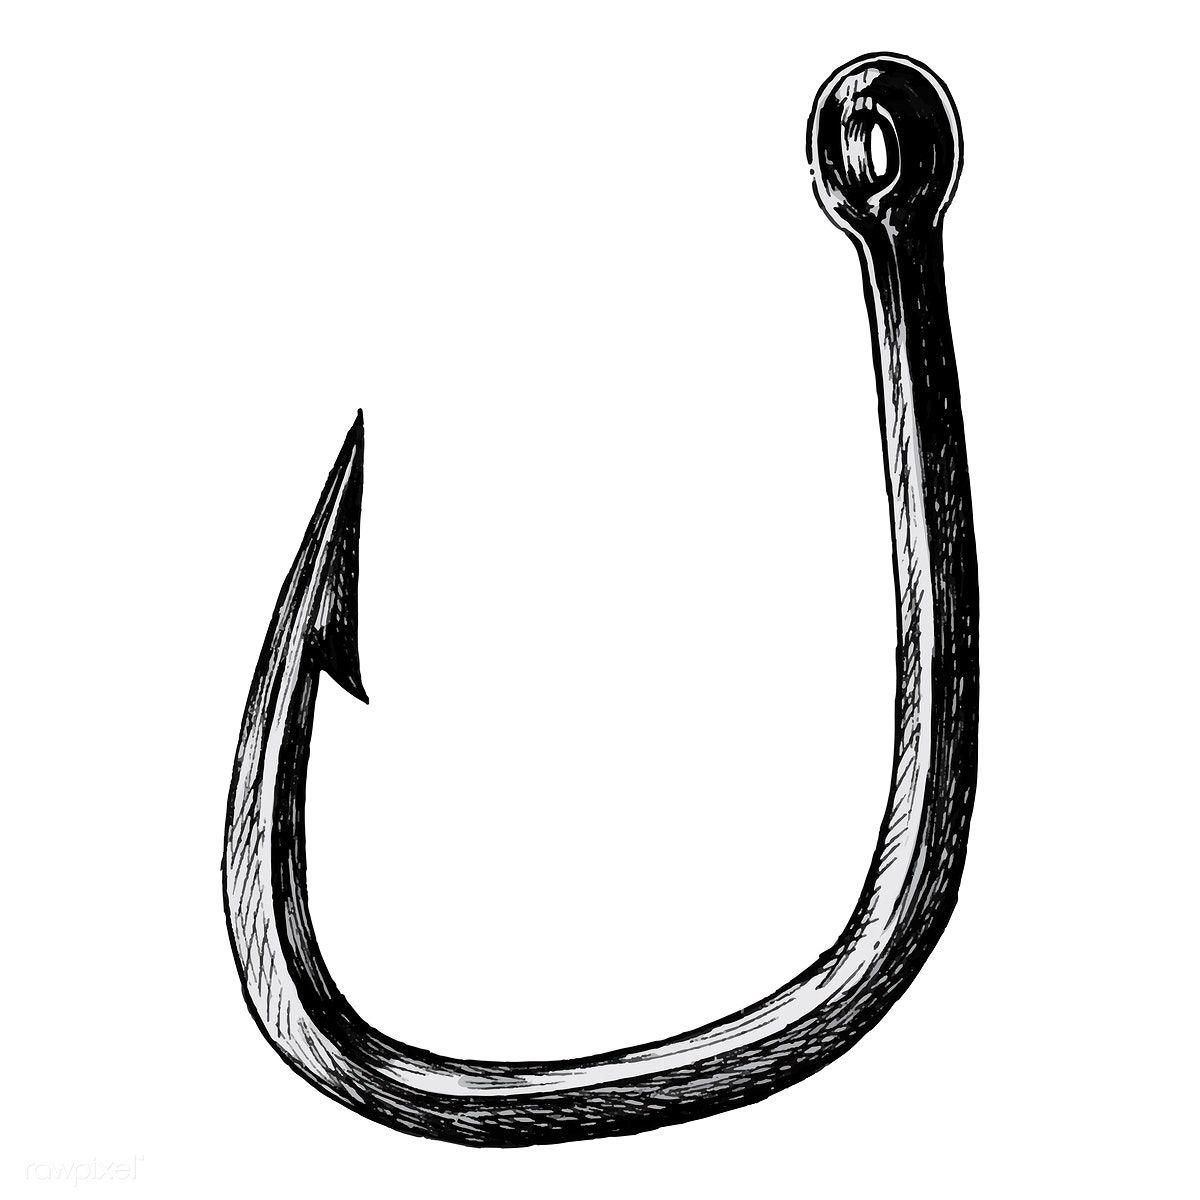 Download Premium Vector Of Hand Drawn Fish Hook Isolated 407054 Drawn Fish Fish Hook Fishing Hook Tattoo